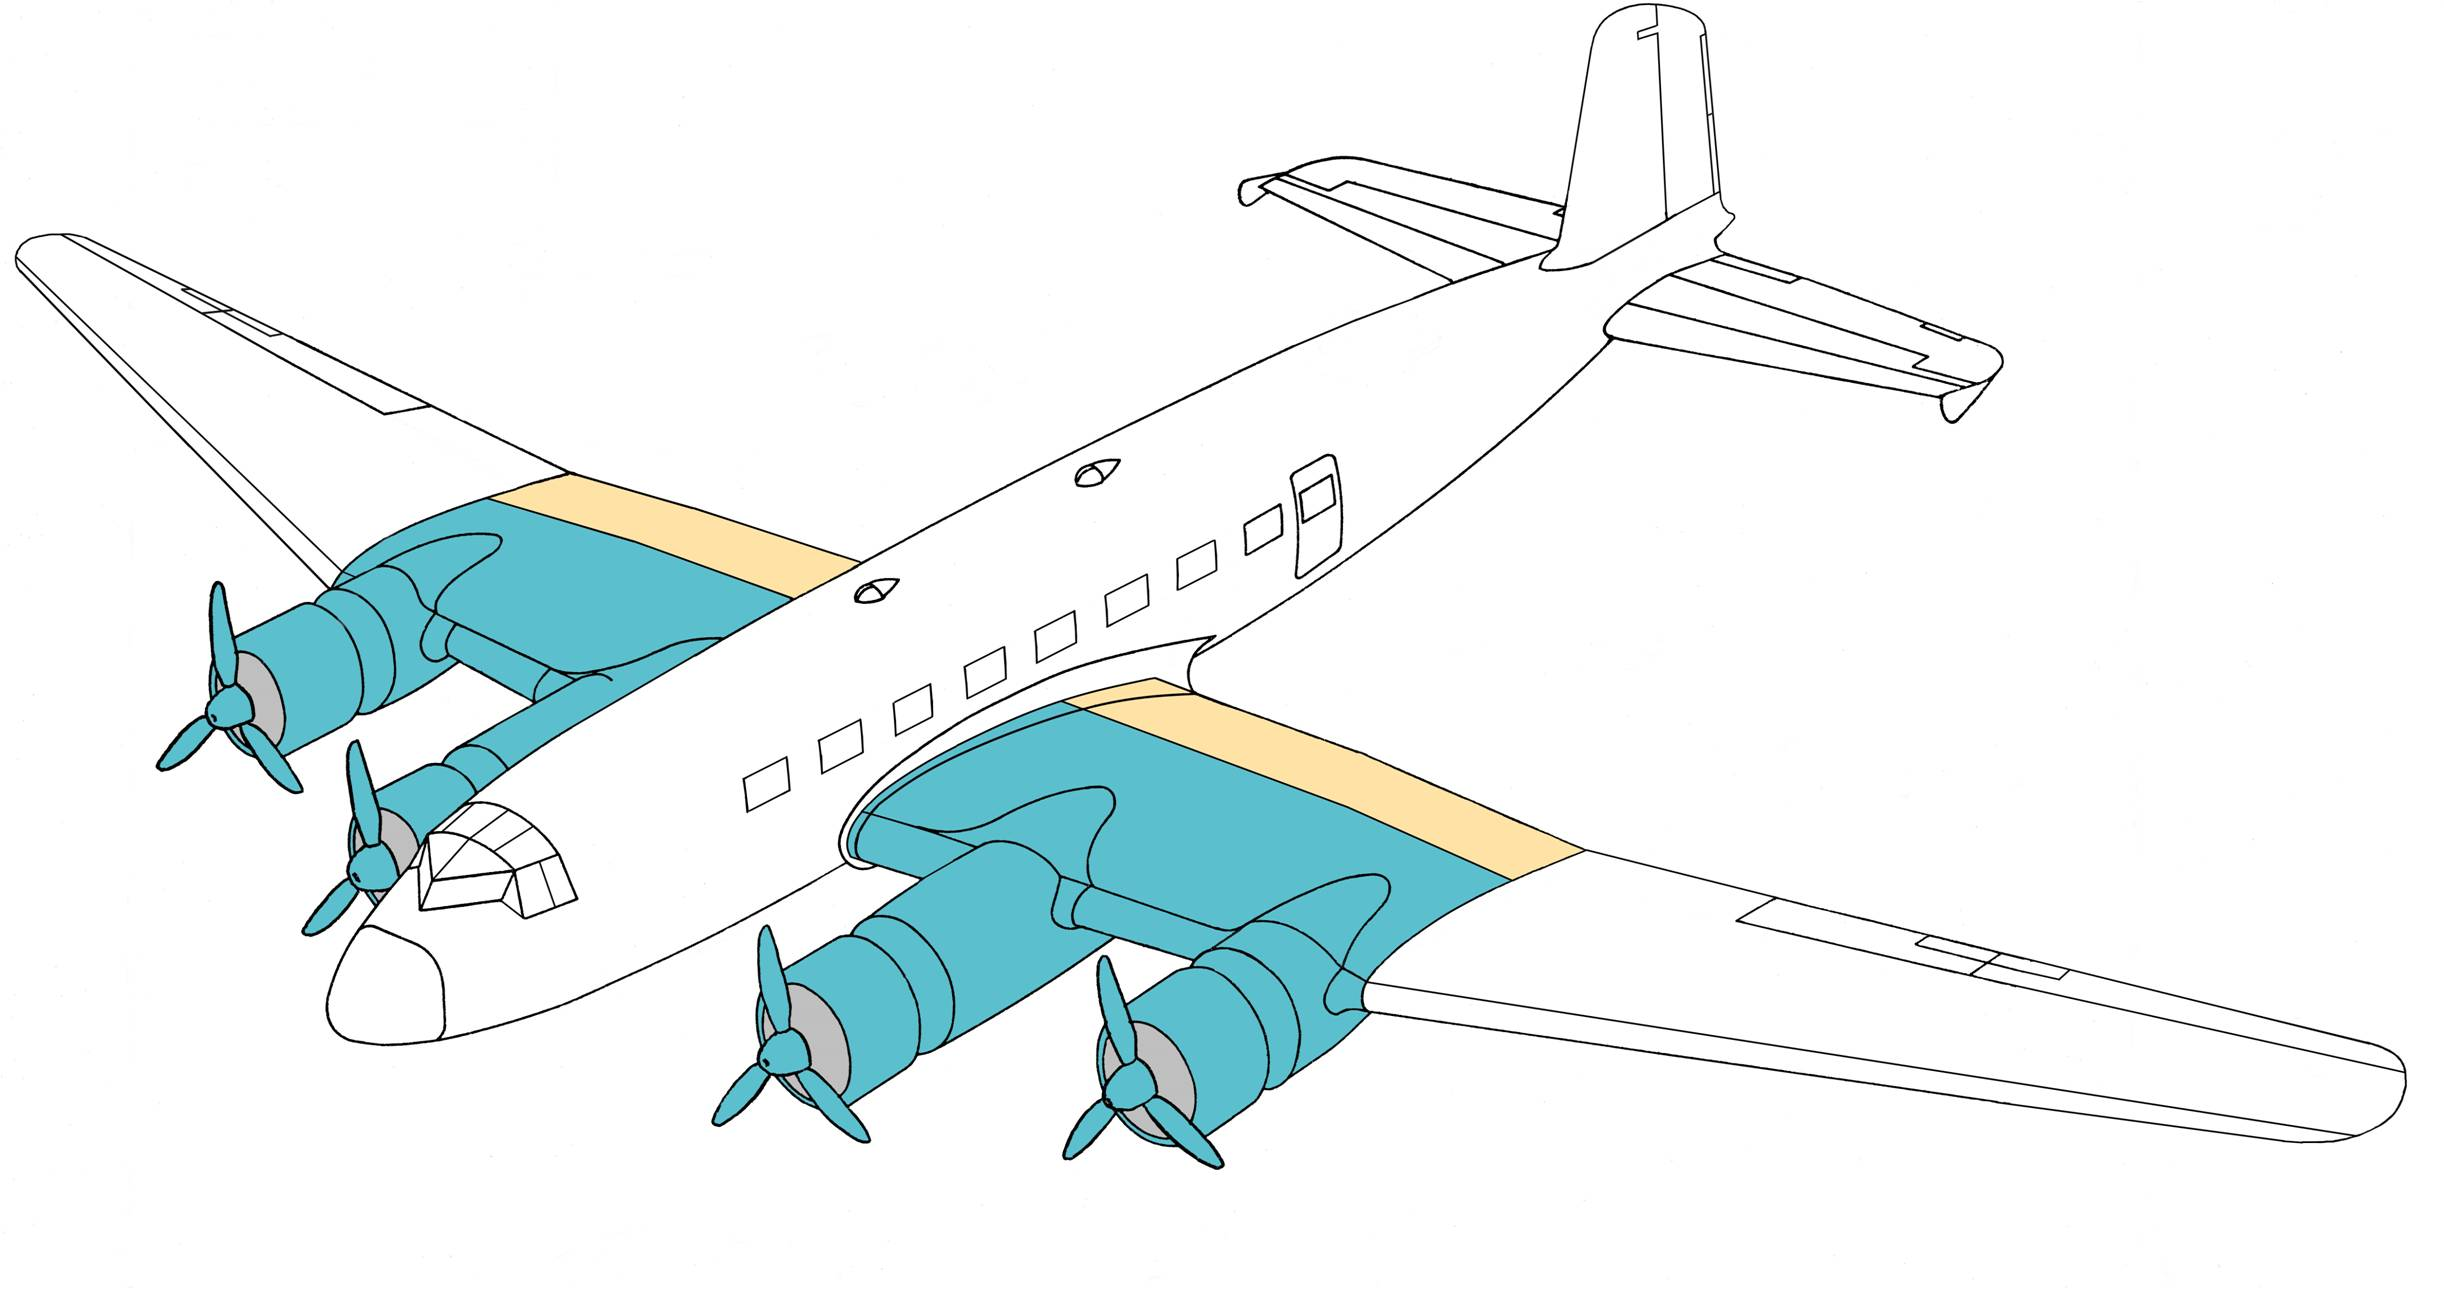 beide Innenflügel markiert, Endkästen farbig anders markiert